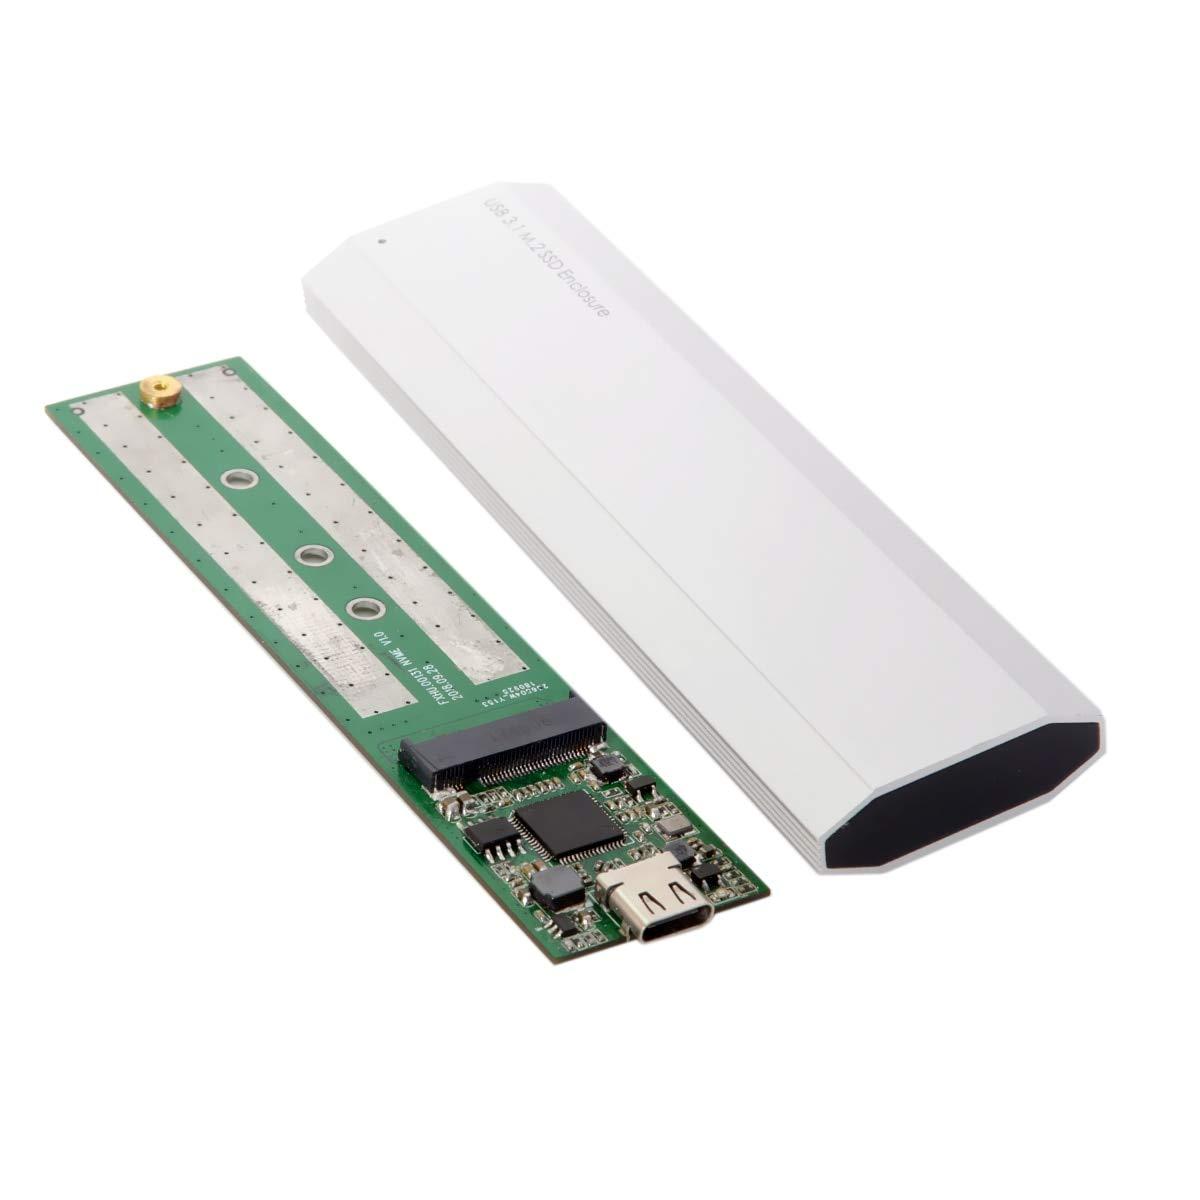 YOUKITTY Type-C USB-C USB 3.1 3.0 10Gbps to Nvme M-Key M.2 NGFF PCI-E 2 Lane SSD Enclosure for M-Key NVME SSD